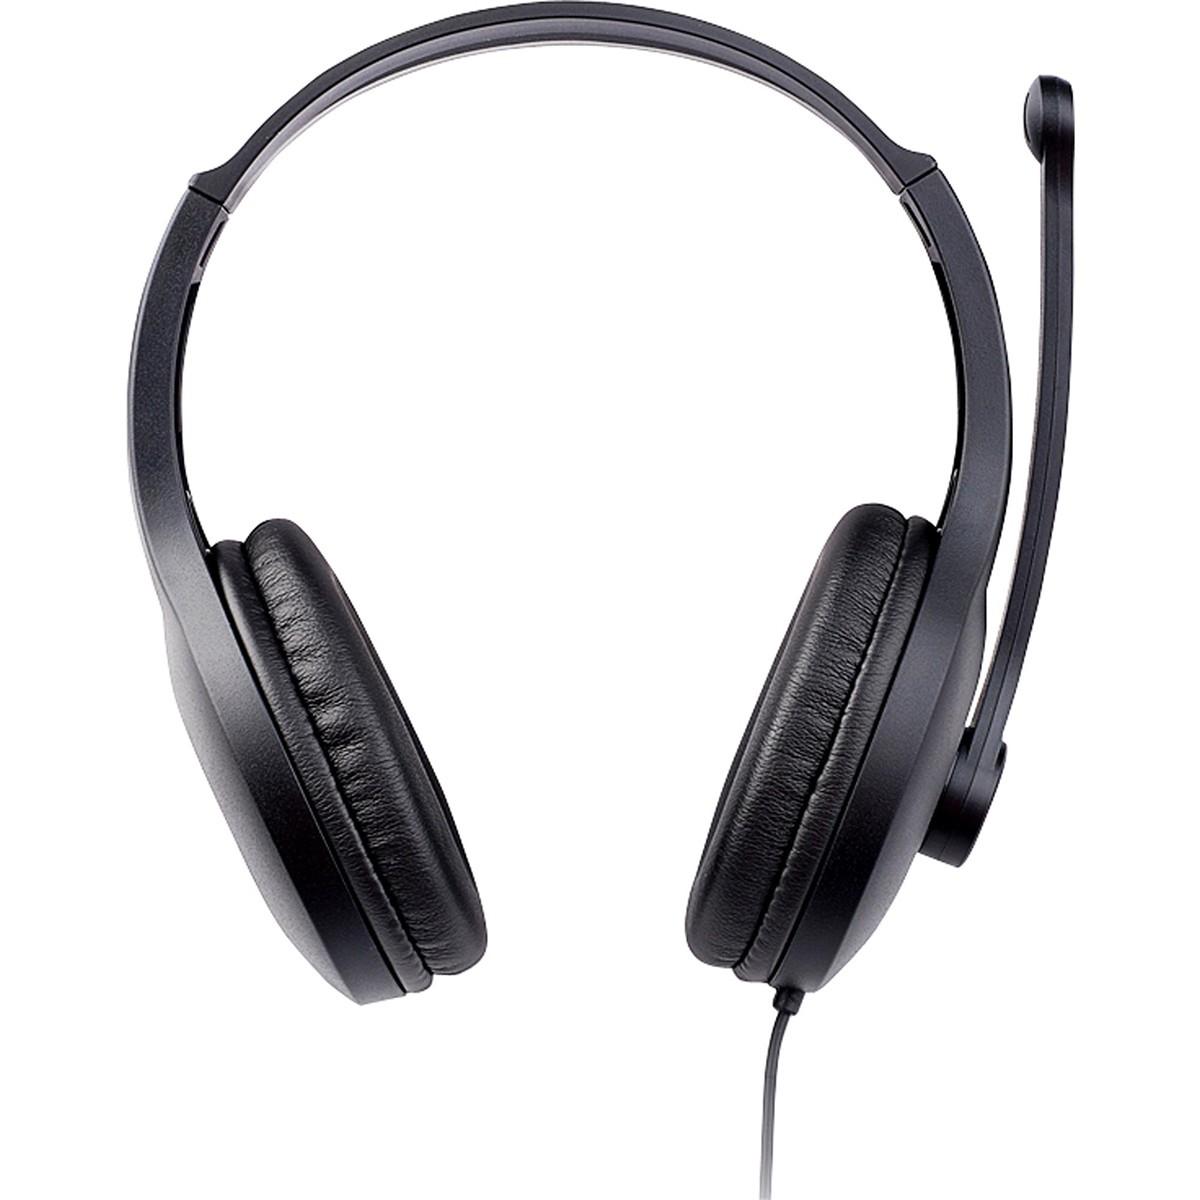 Edifier K800 Fone com Microfone, Headset Gamer, Preto